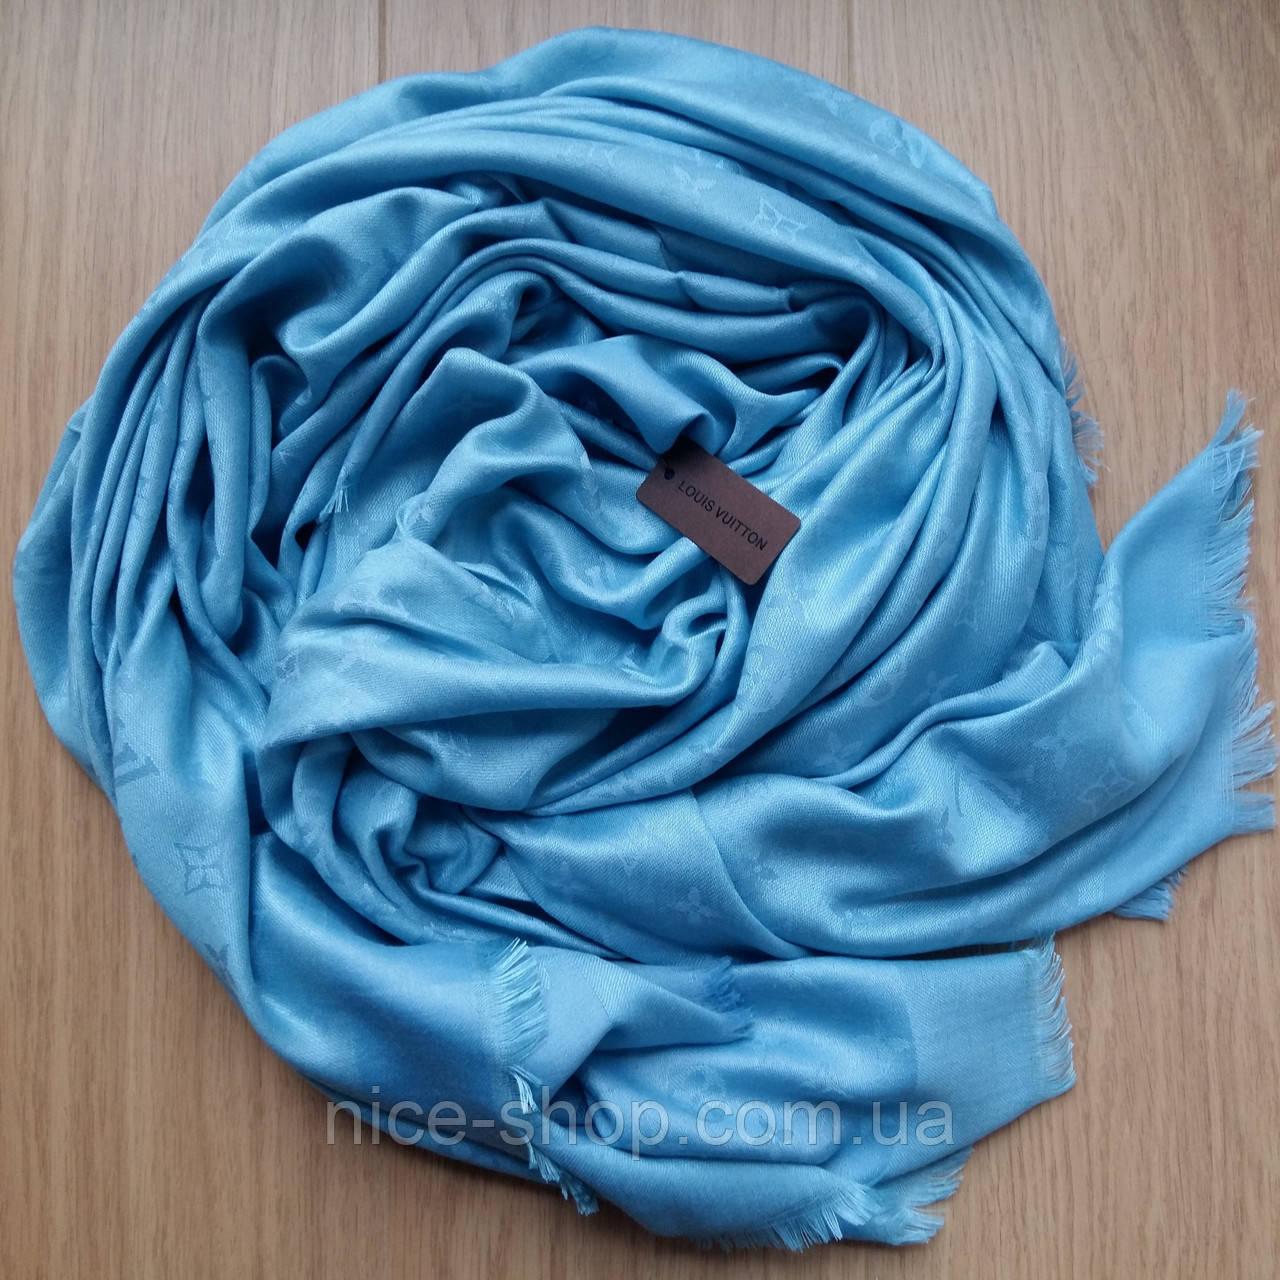 262c0566b485 Платок Louis Vuitton голубой  продажа, цена в Одессе. платки, шали ...